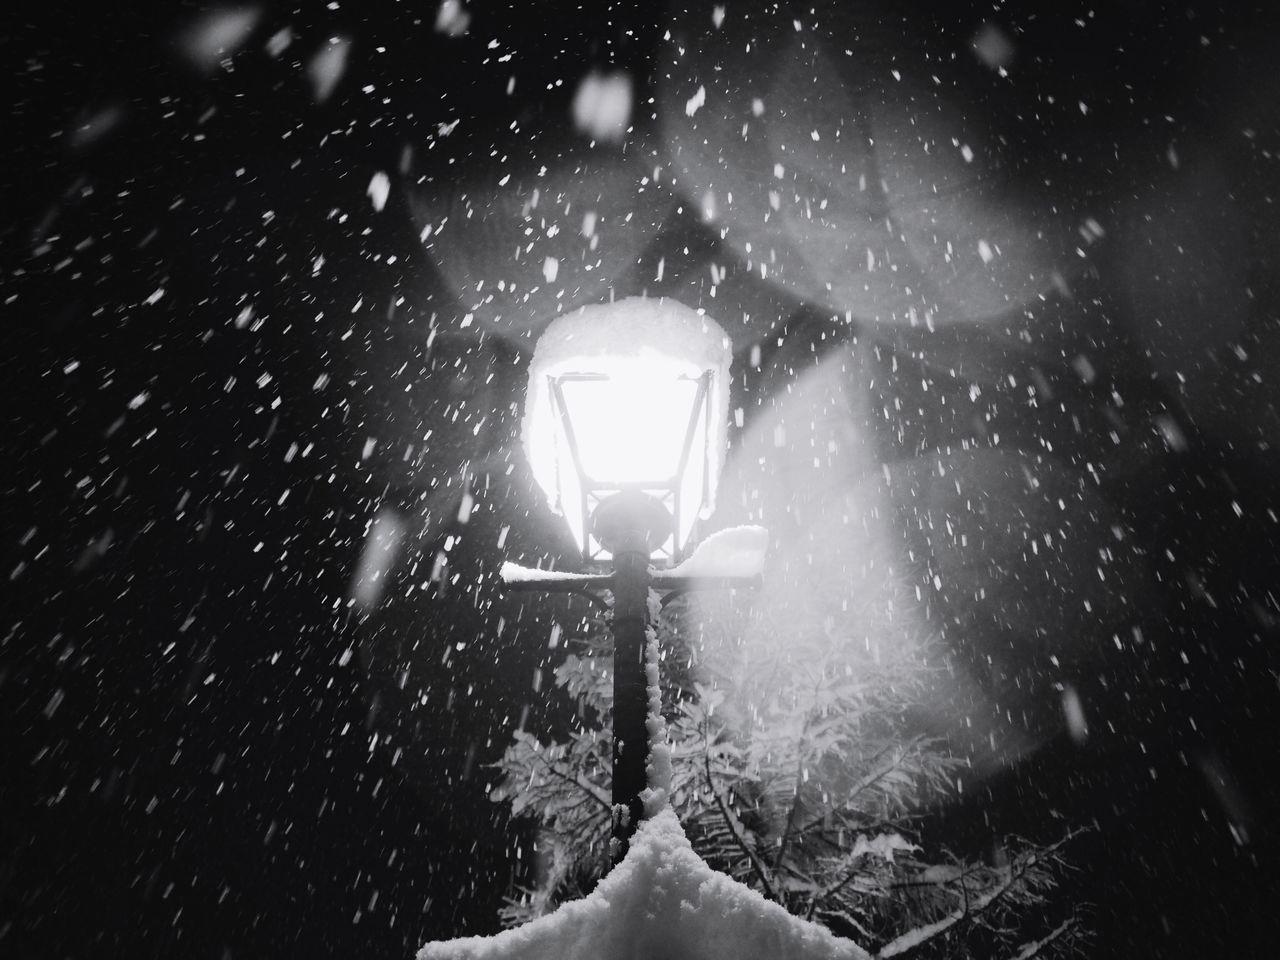 Cold Temperature Close-up No People Winter Snowing Illuminated Outdoors Night Blackandwhite Black & White Blackandwhite Photography Snow at Leukerbad Switzerland